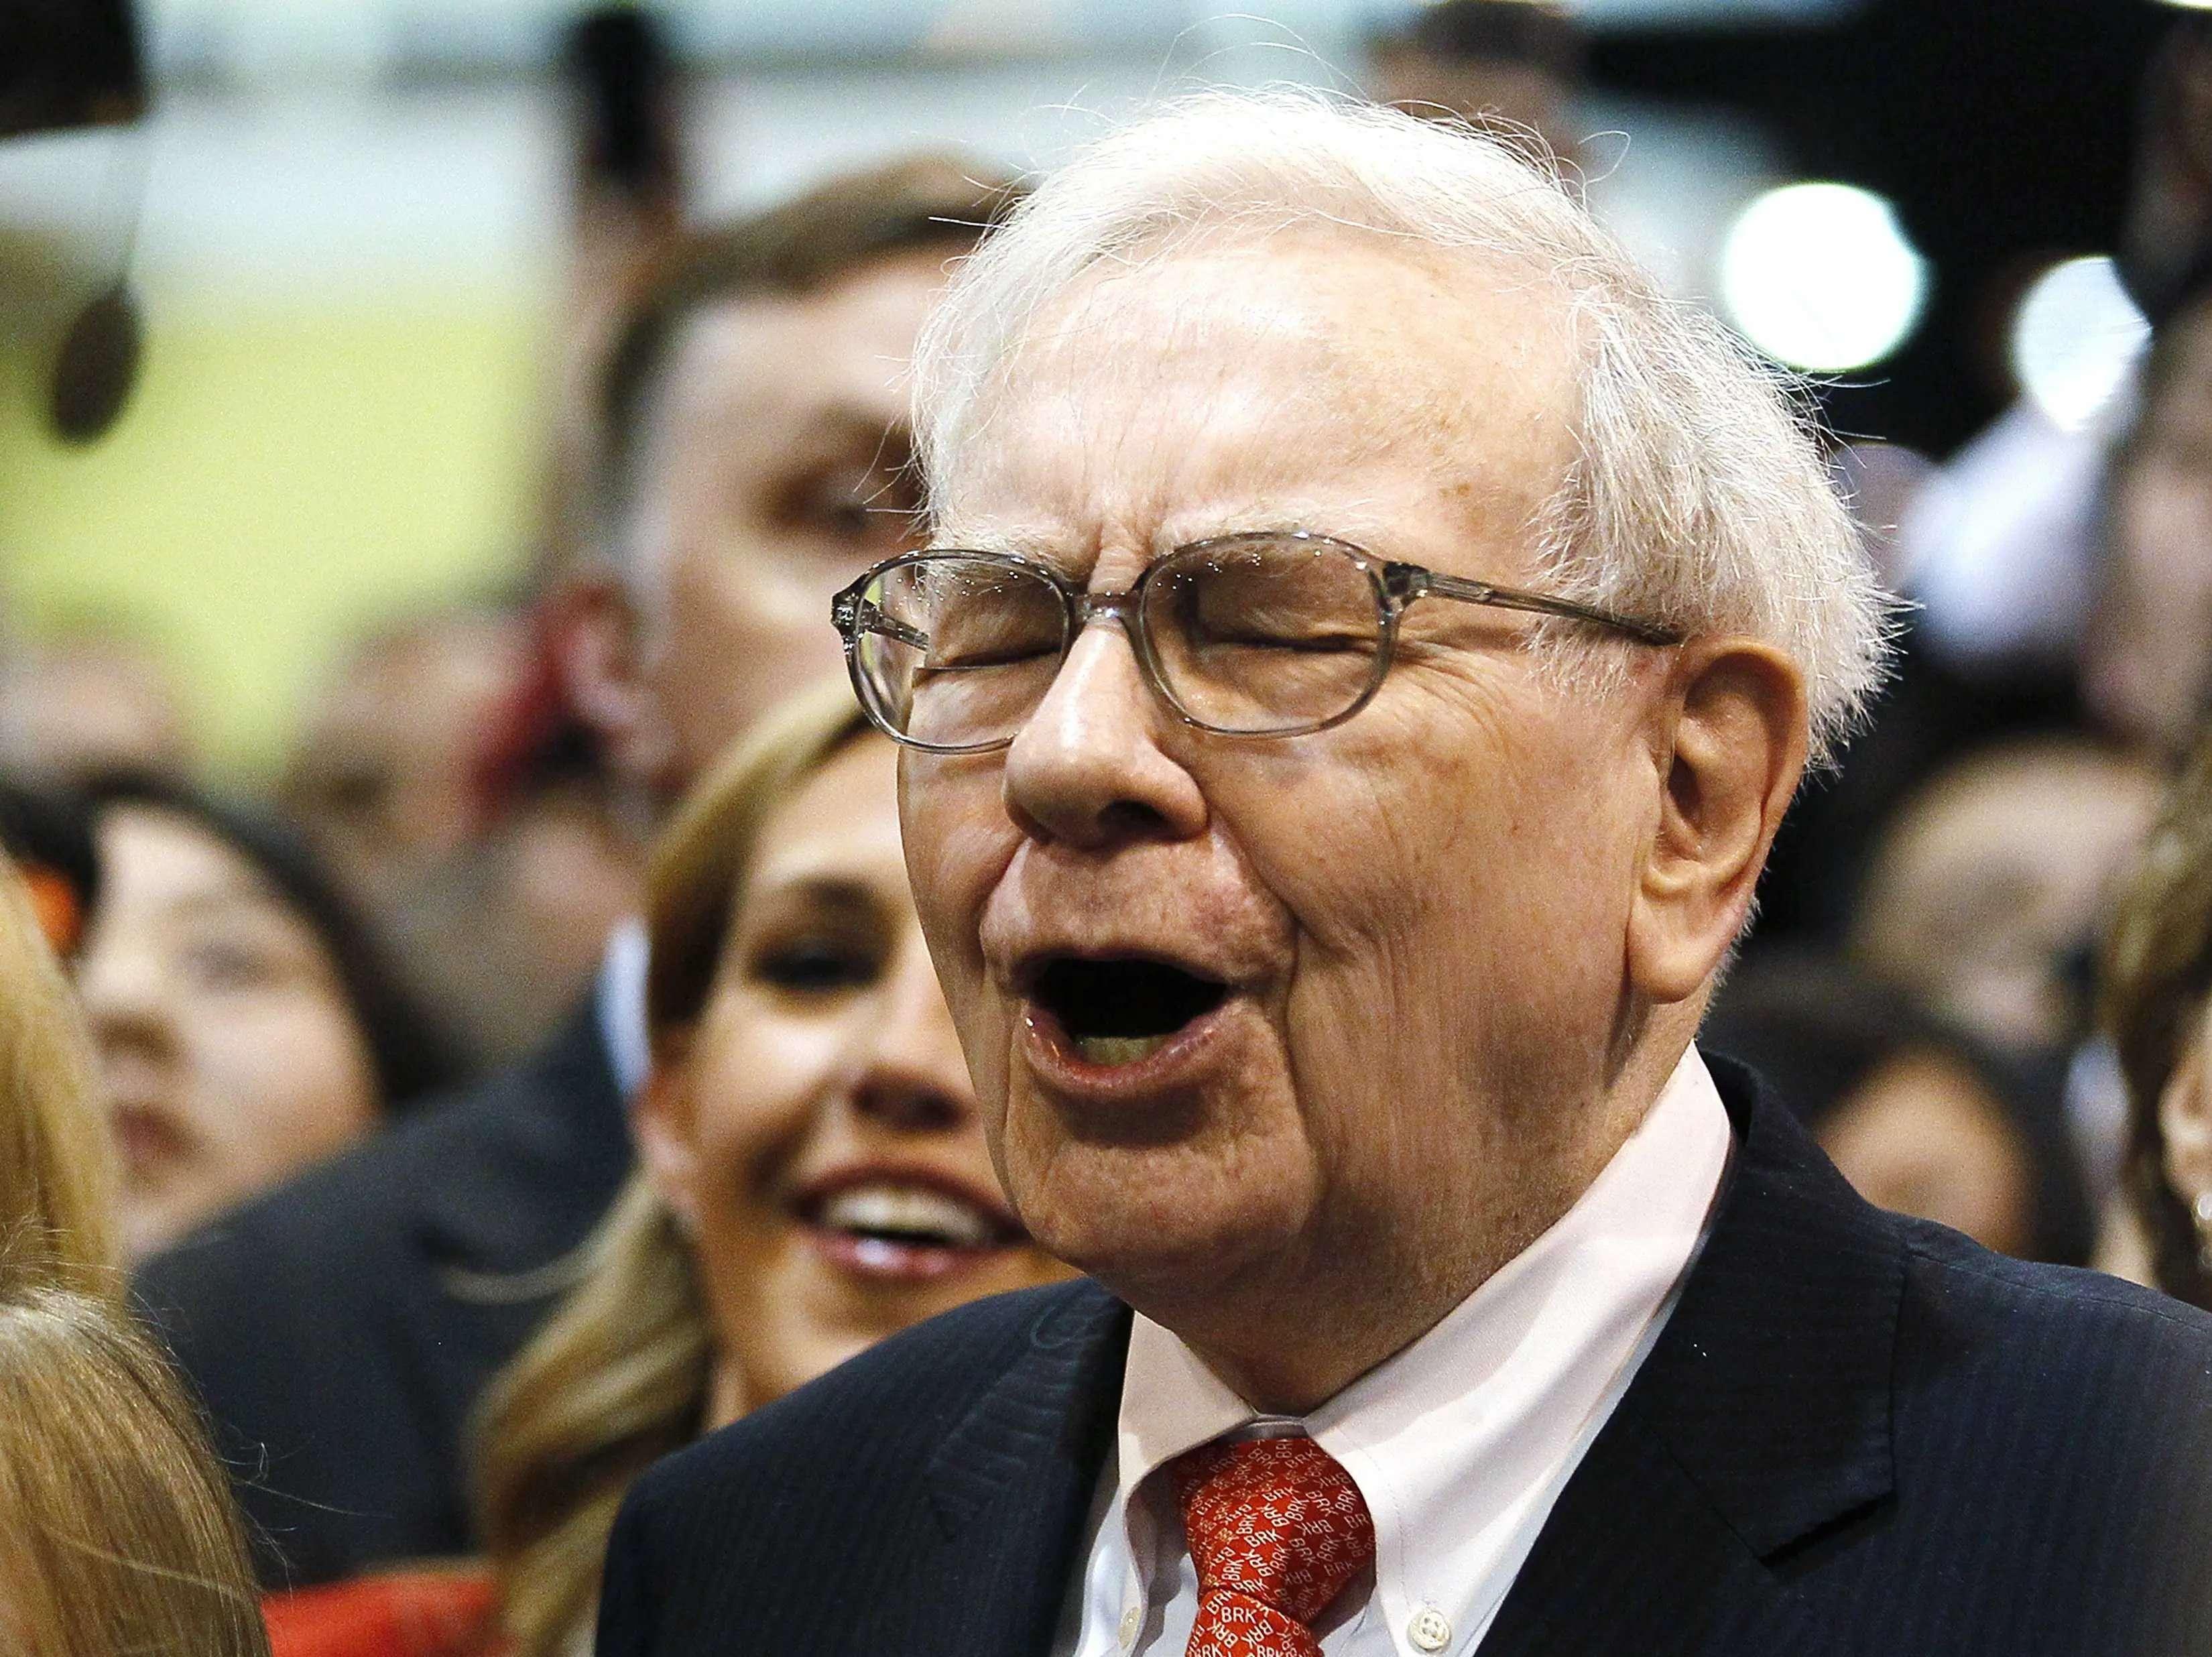 Tickets To Berkshire Hathaway's 2014 Shareholder Meeting